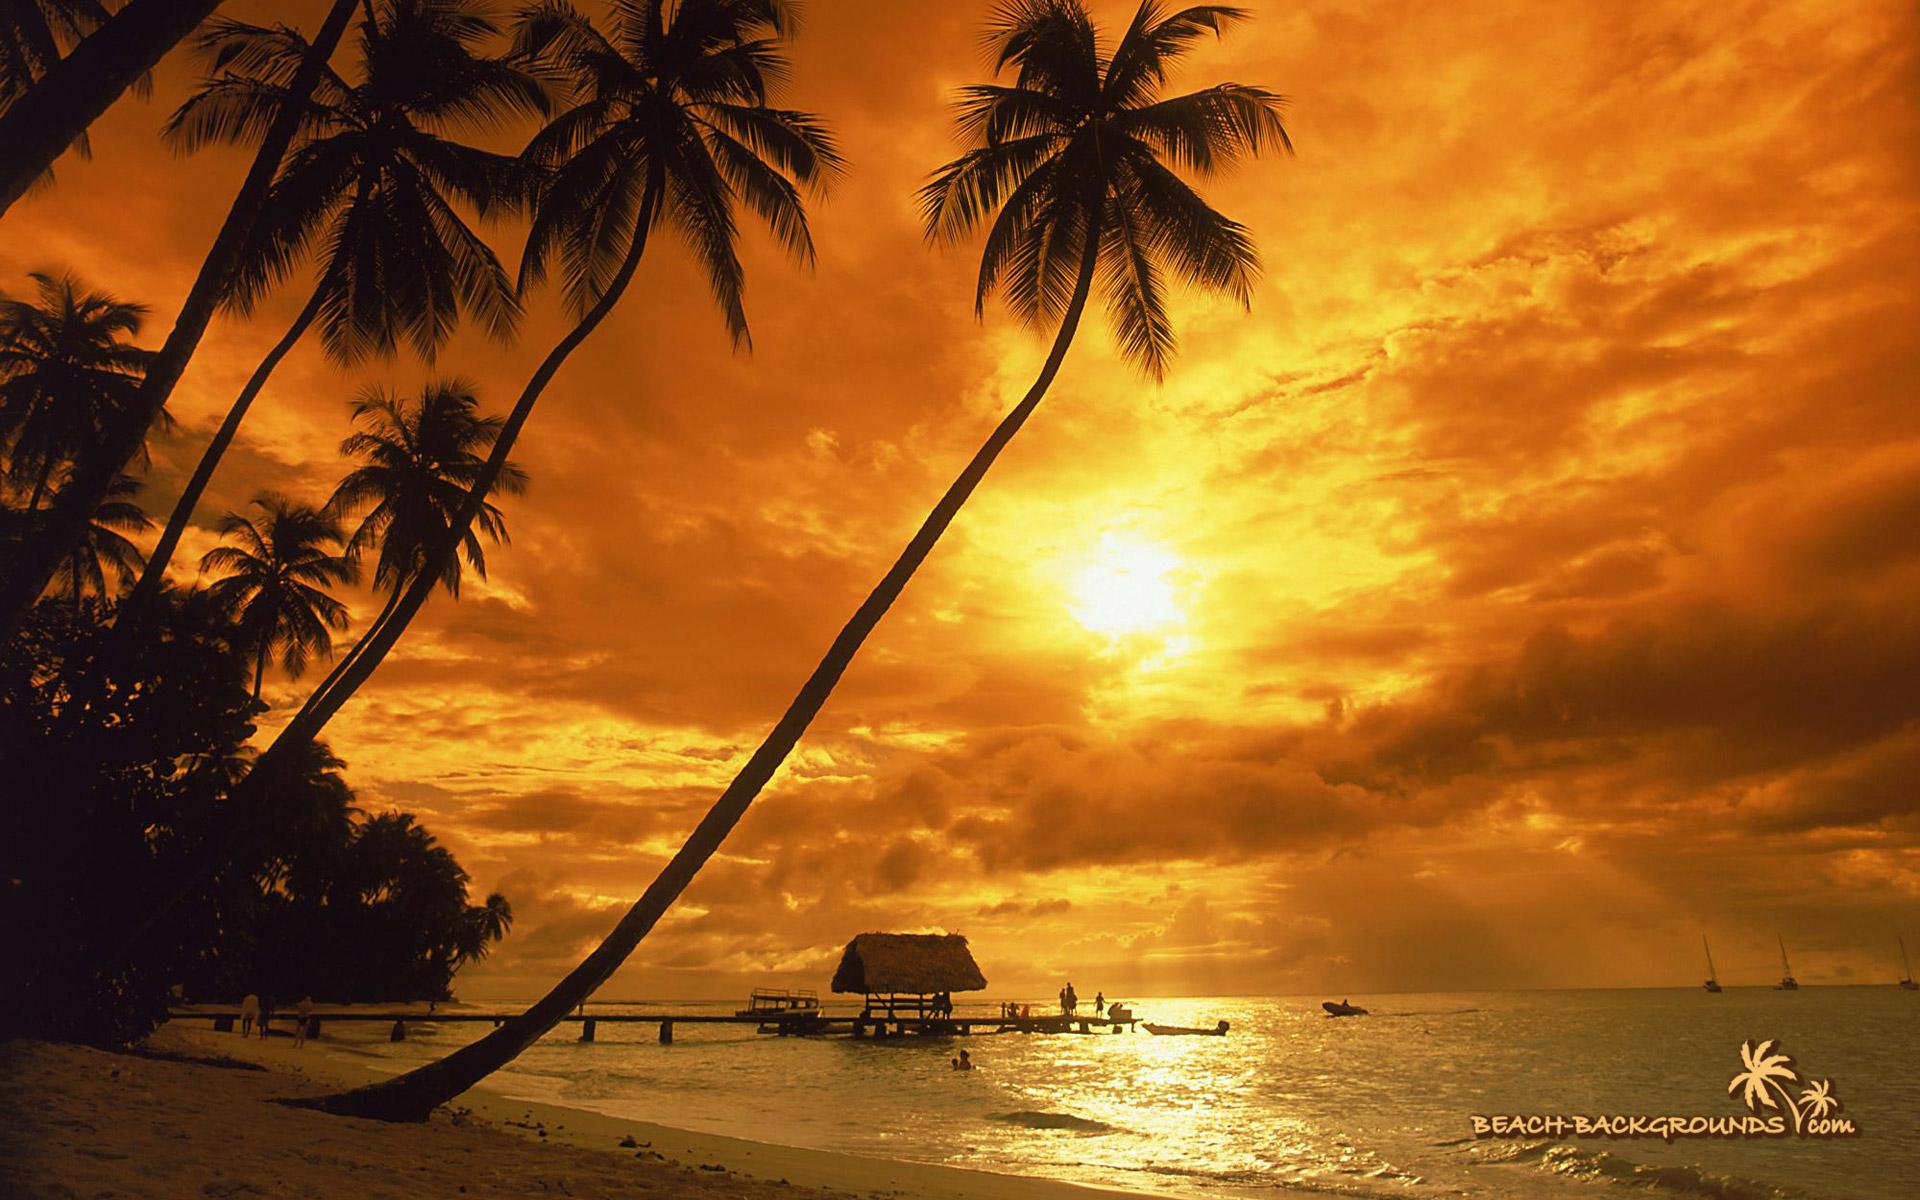 island sunset photos tropical island sunset images tropical island 1920x1200